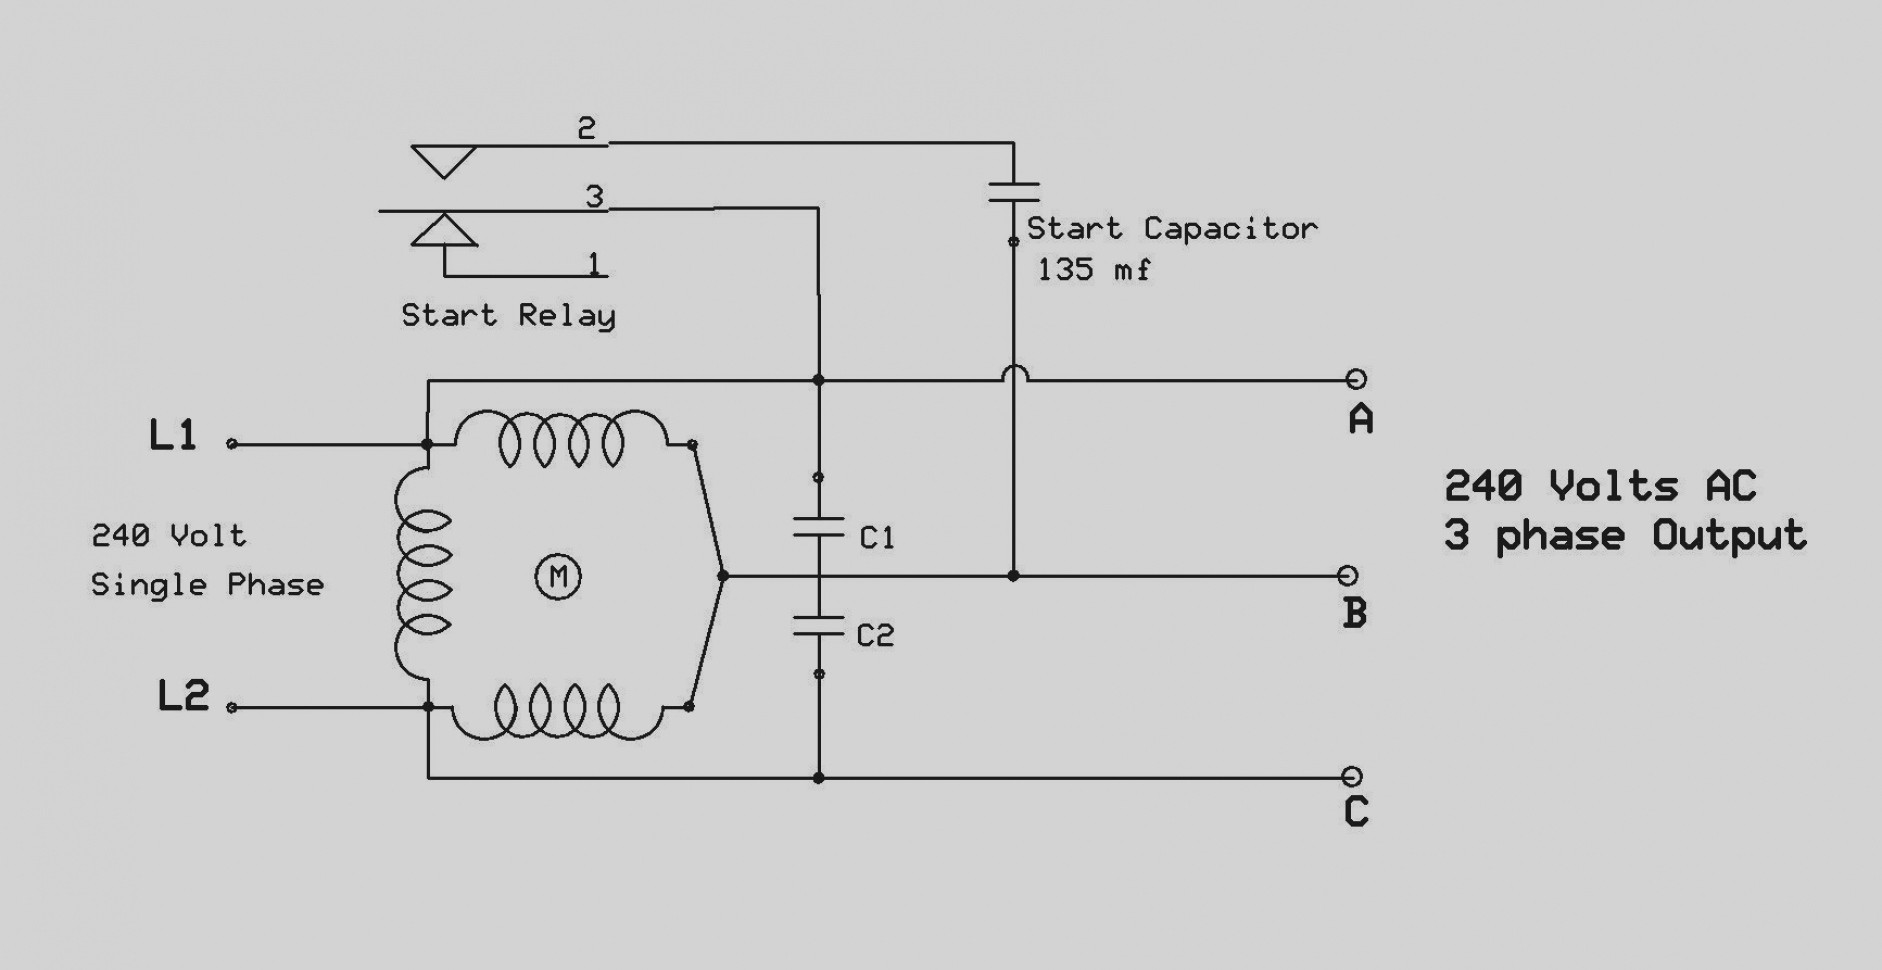 square d hand off auto wiring diagram drayton central heating programmer 3 phase motor starter impremedia